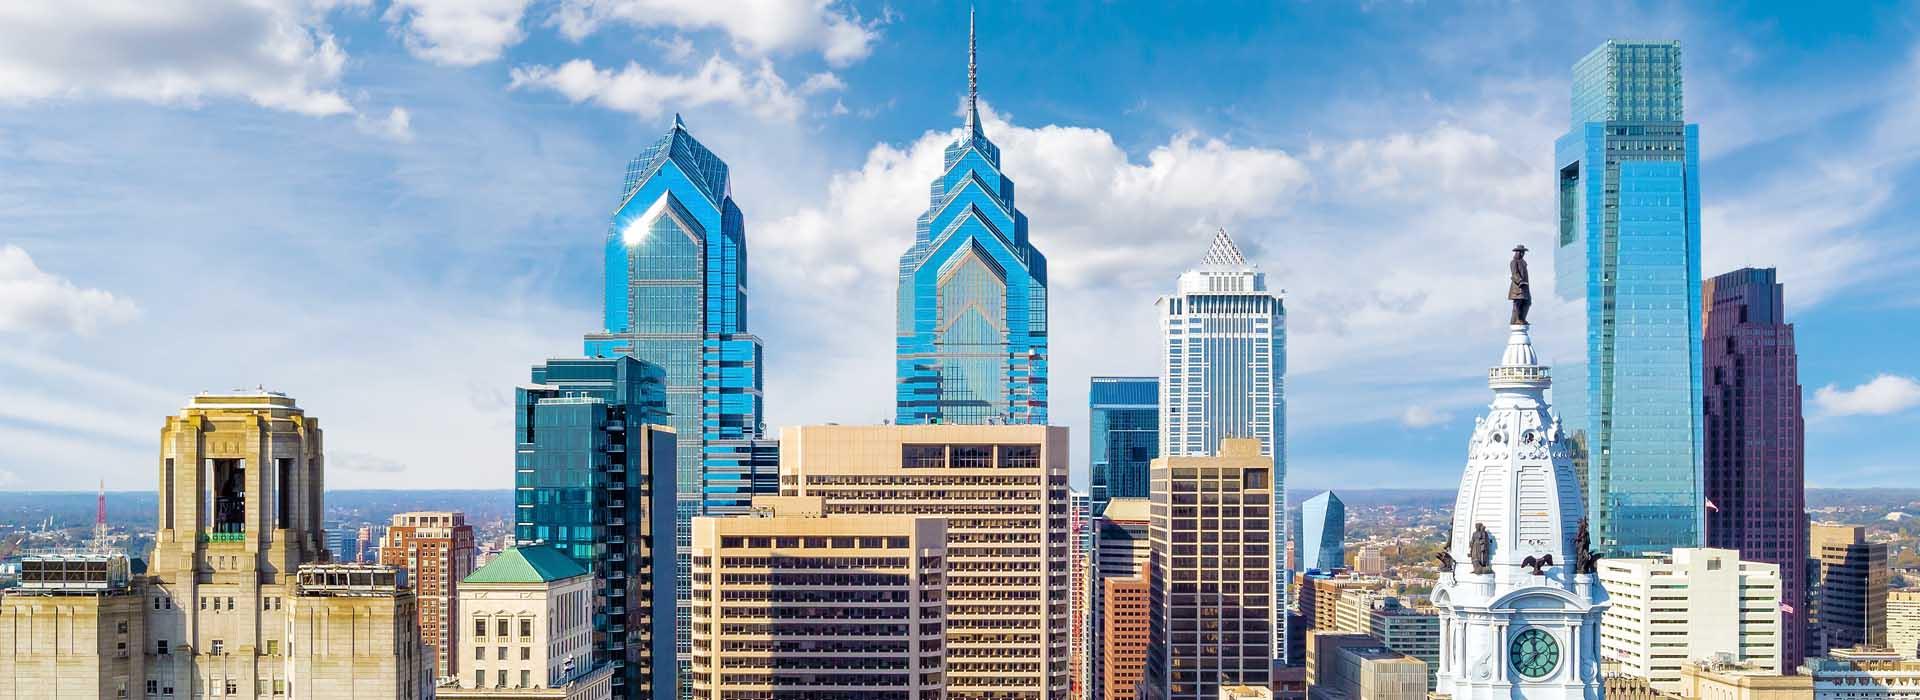 philadelphia_skyscrapers_shutterstock_382990951_1920x700